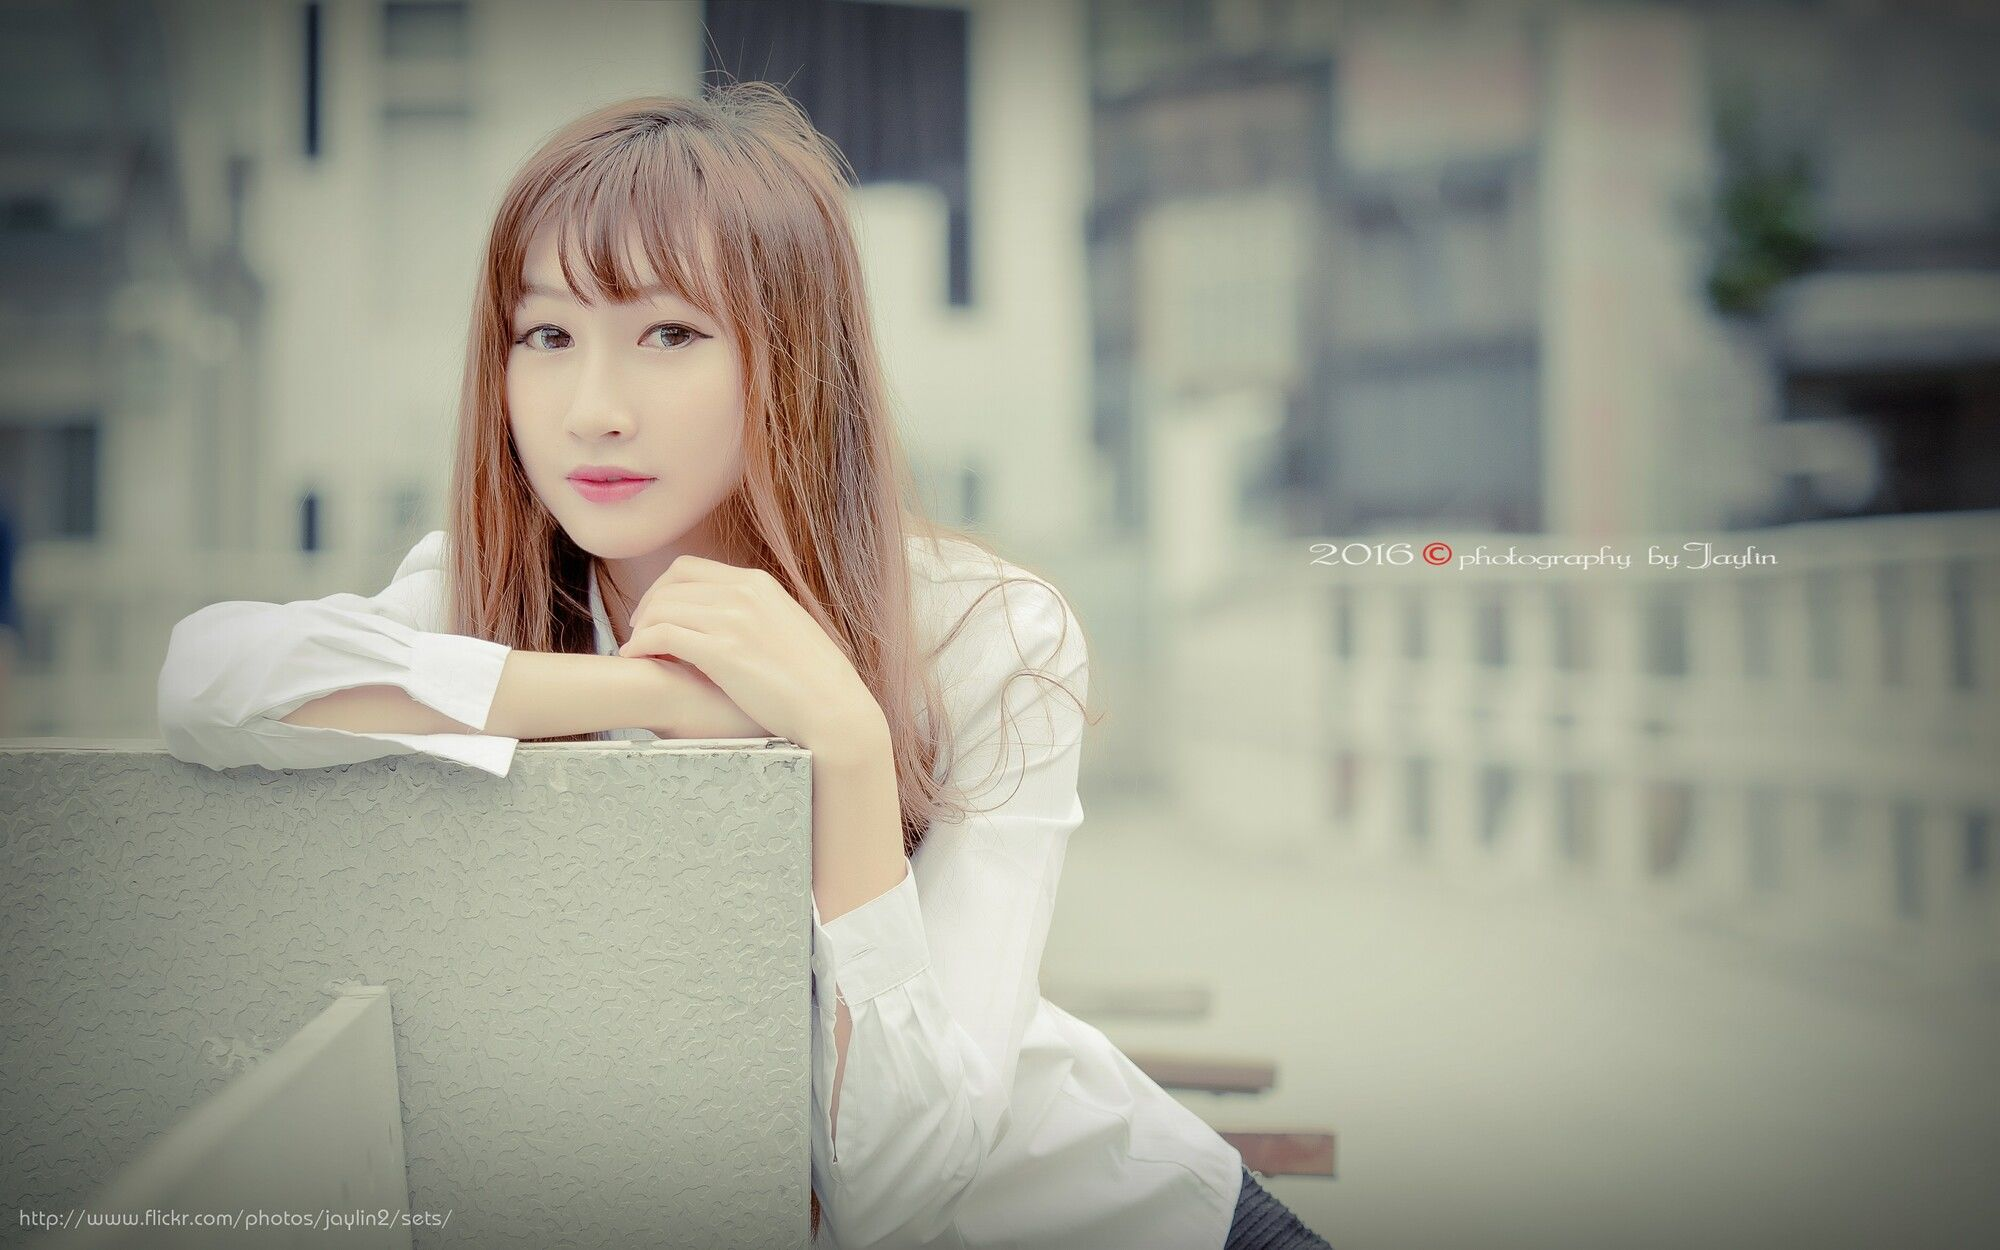 VOL.1563 [台湾正妹]街拍正妹:沈雅琪(沈琪琪Mibo)超高清个人性感漂亮大图(45P)